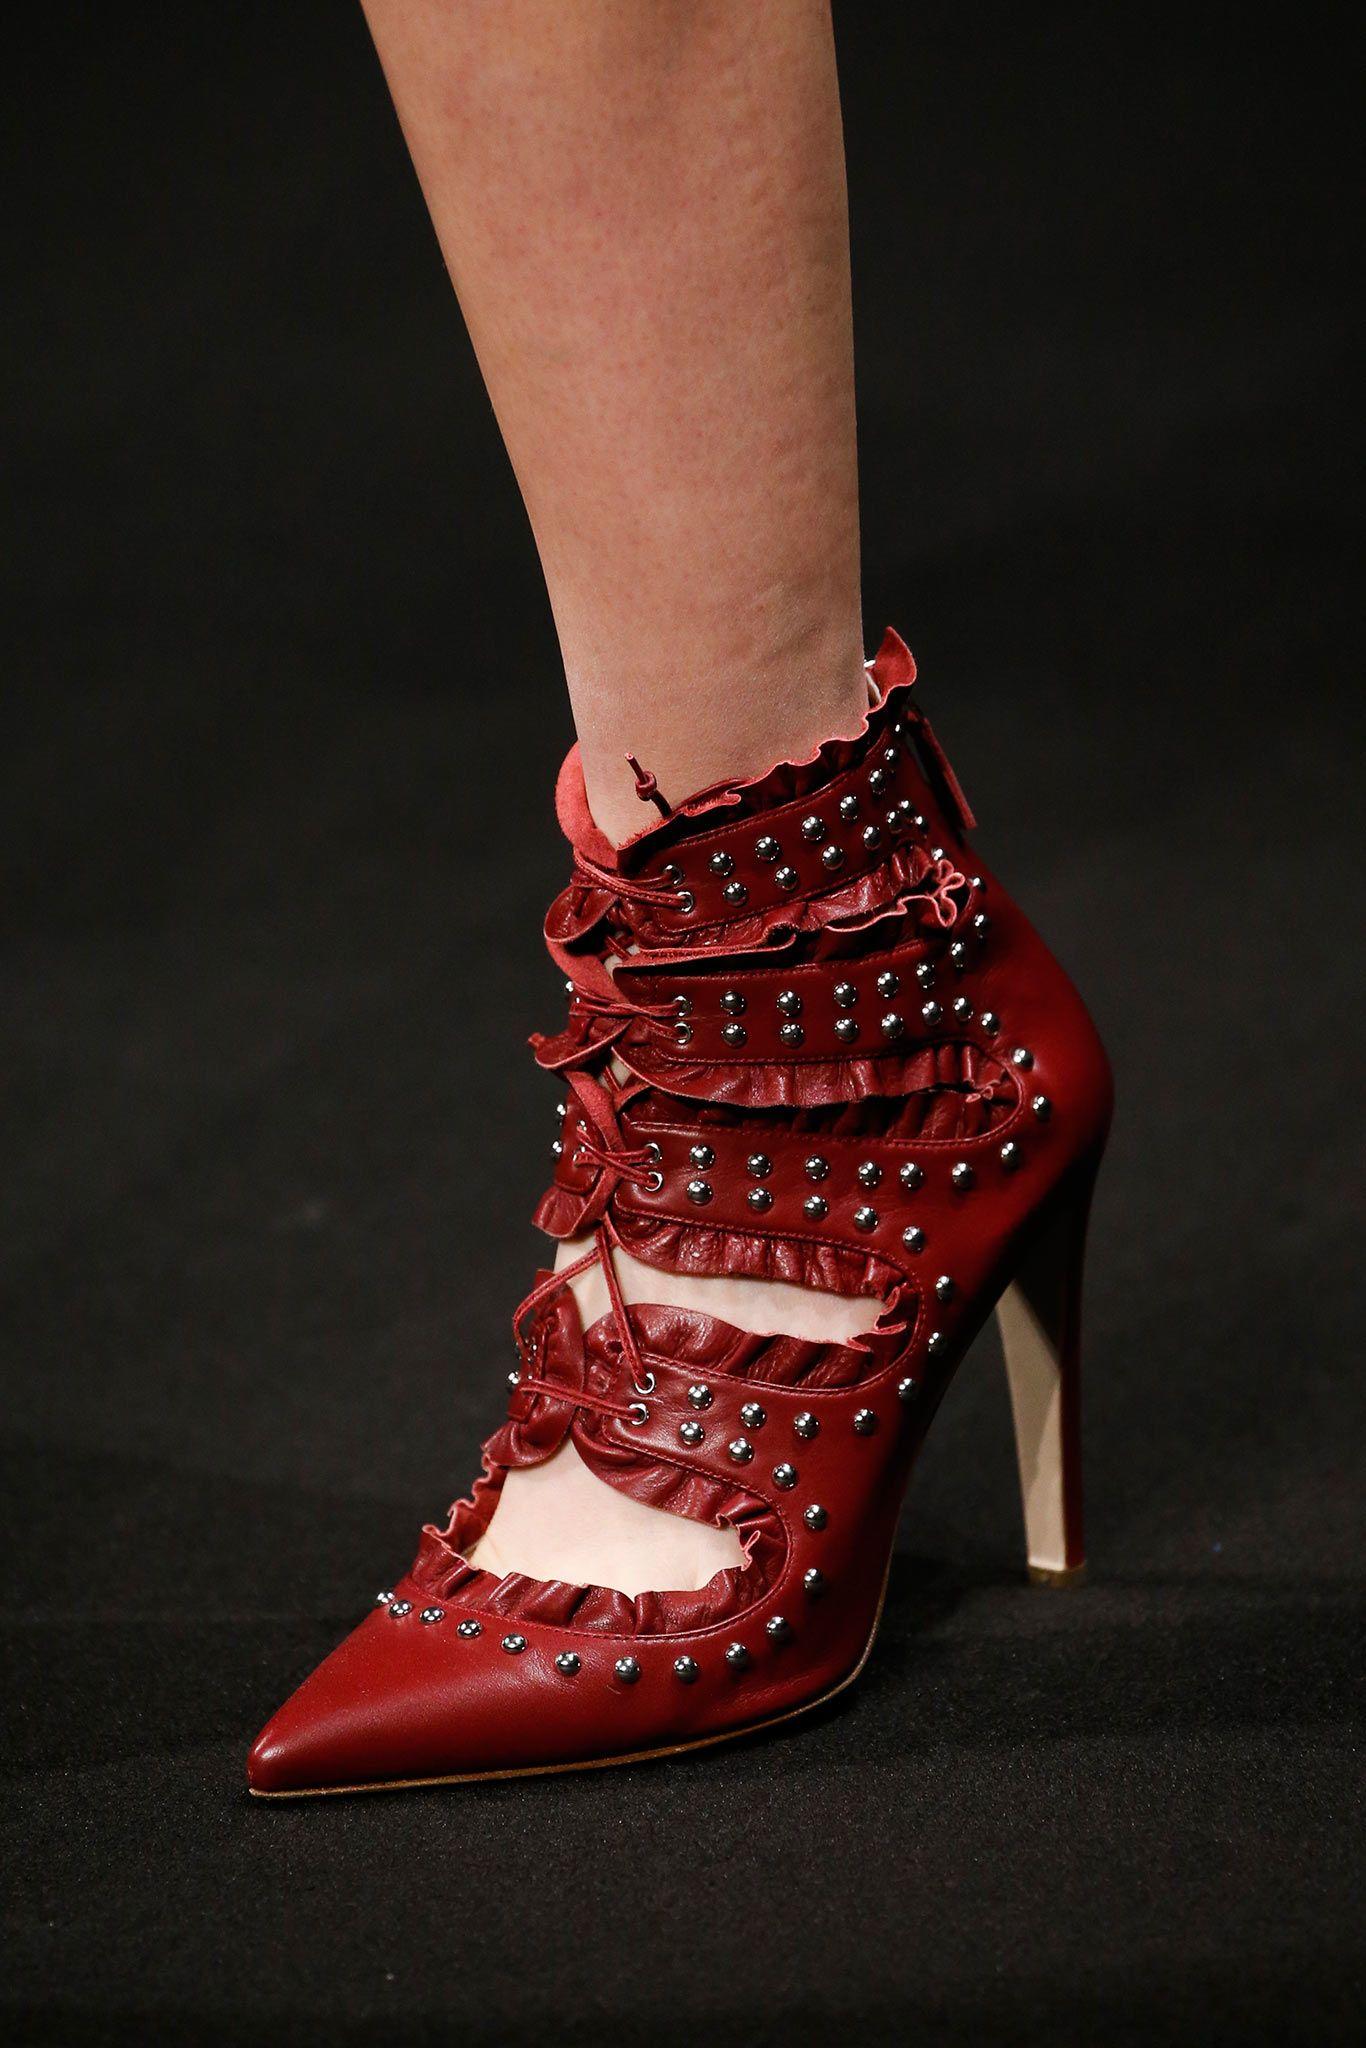 Altuzarra Fall 2015 Ankle Boots RTW Shoes